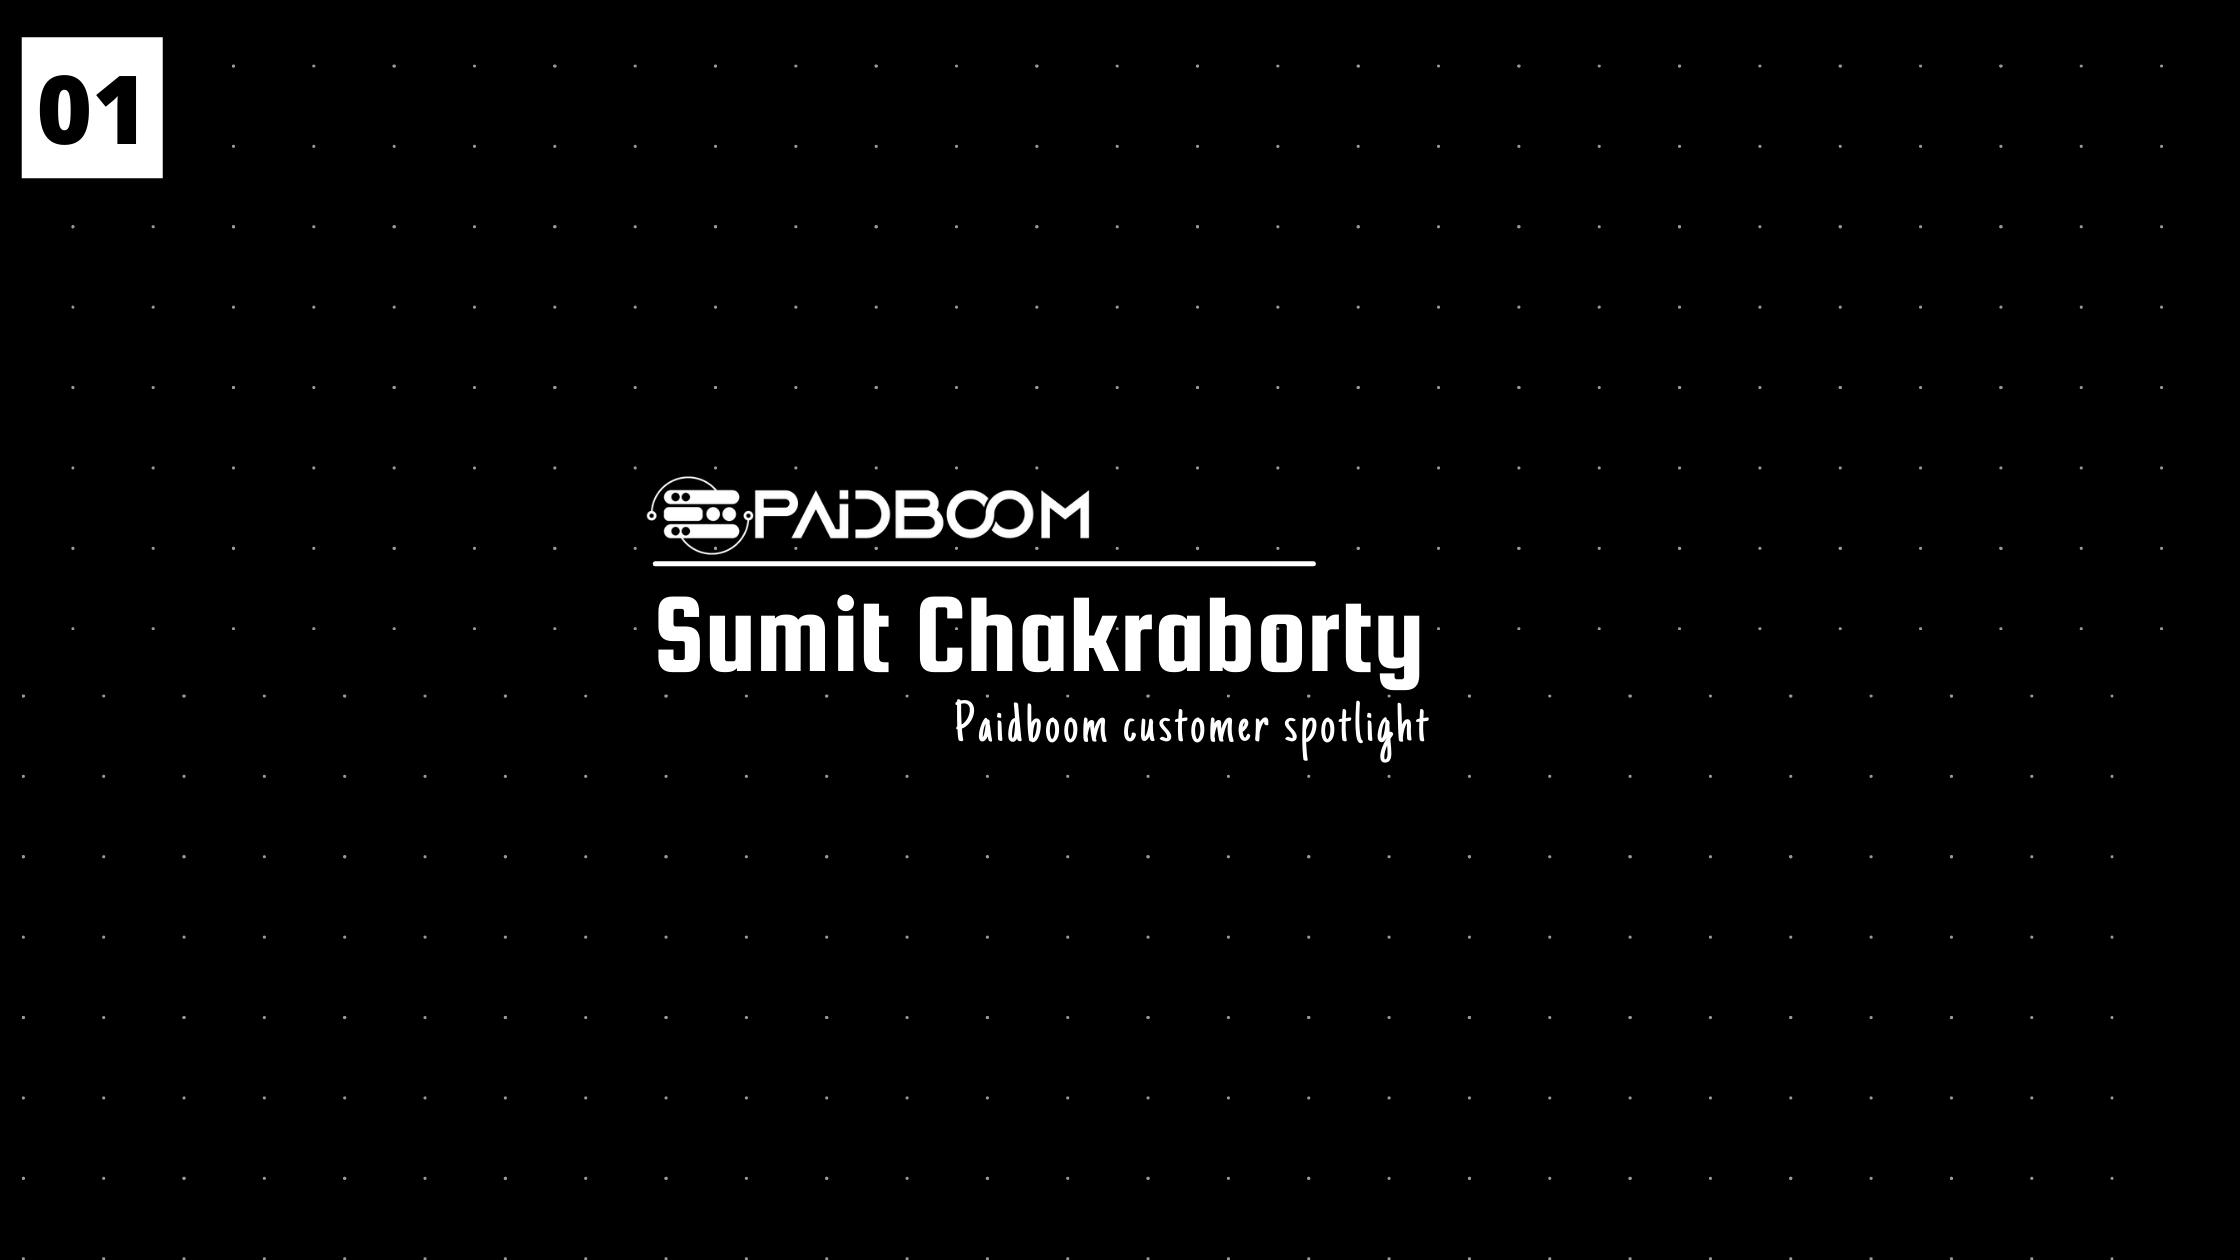 Paidboom customer spotlight 01